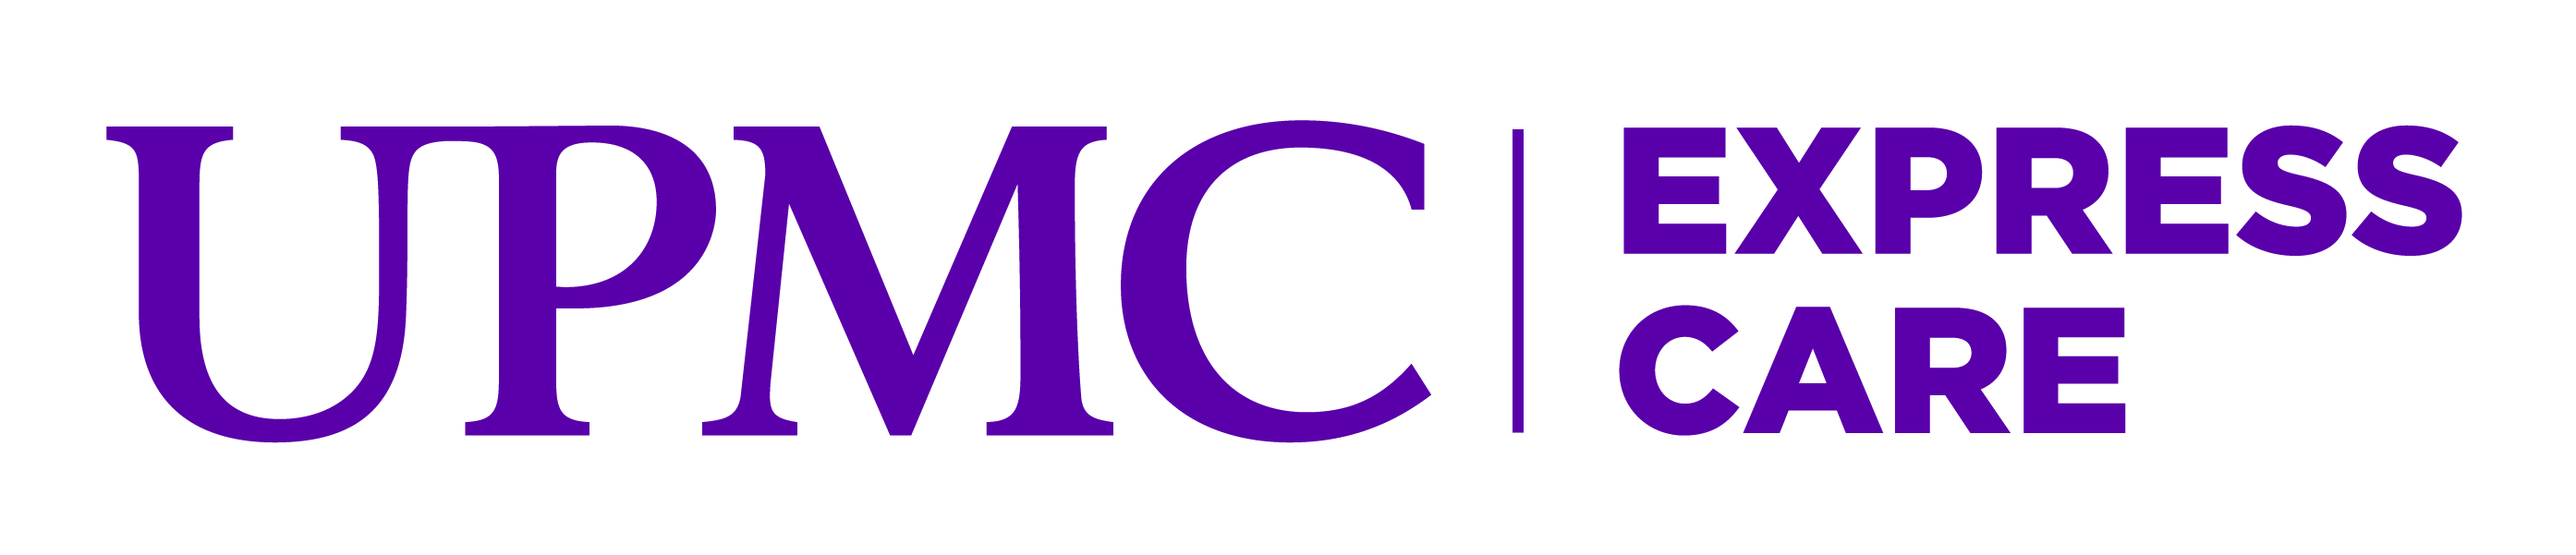 Upmc expresscare h 1c  1  logo